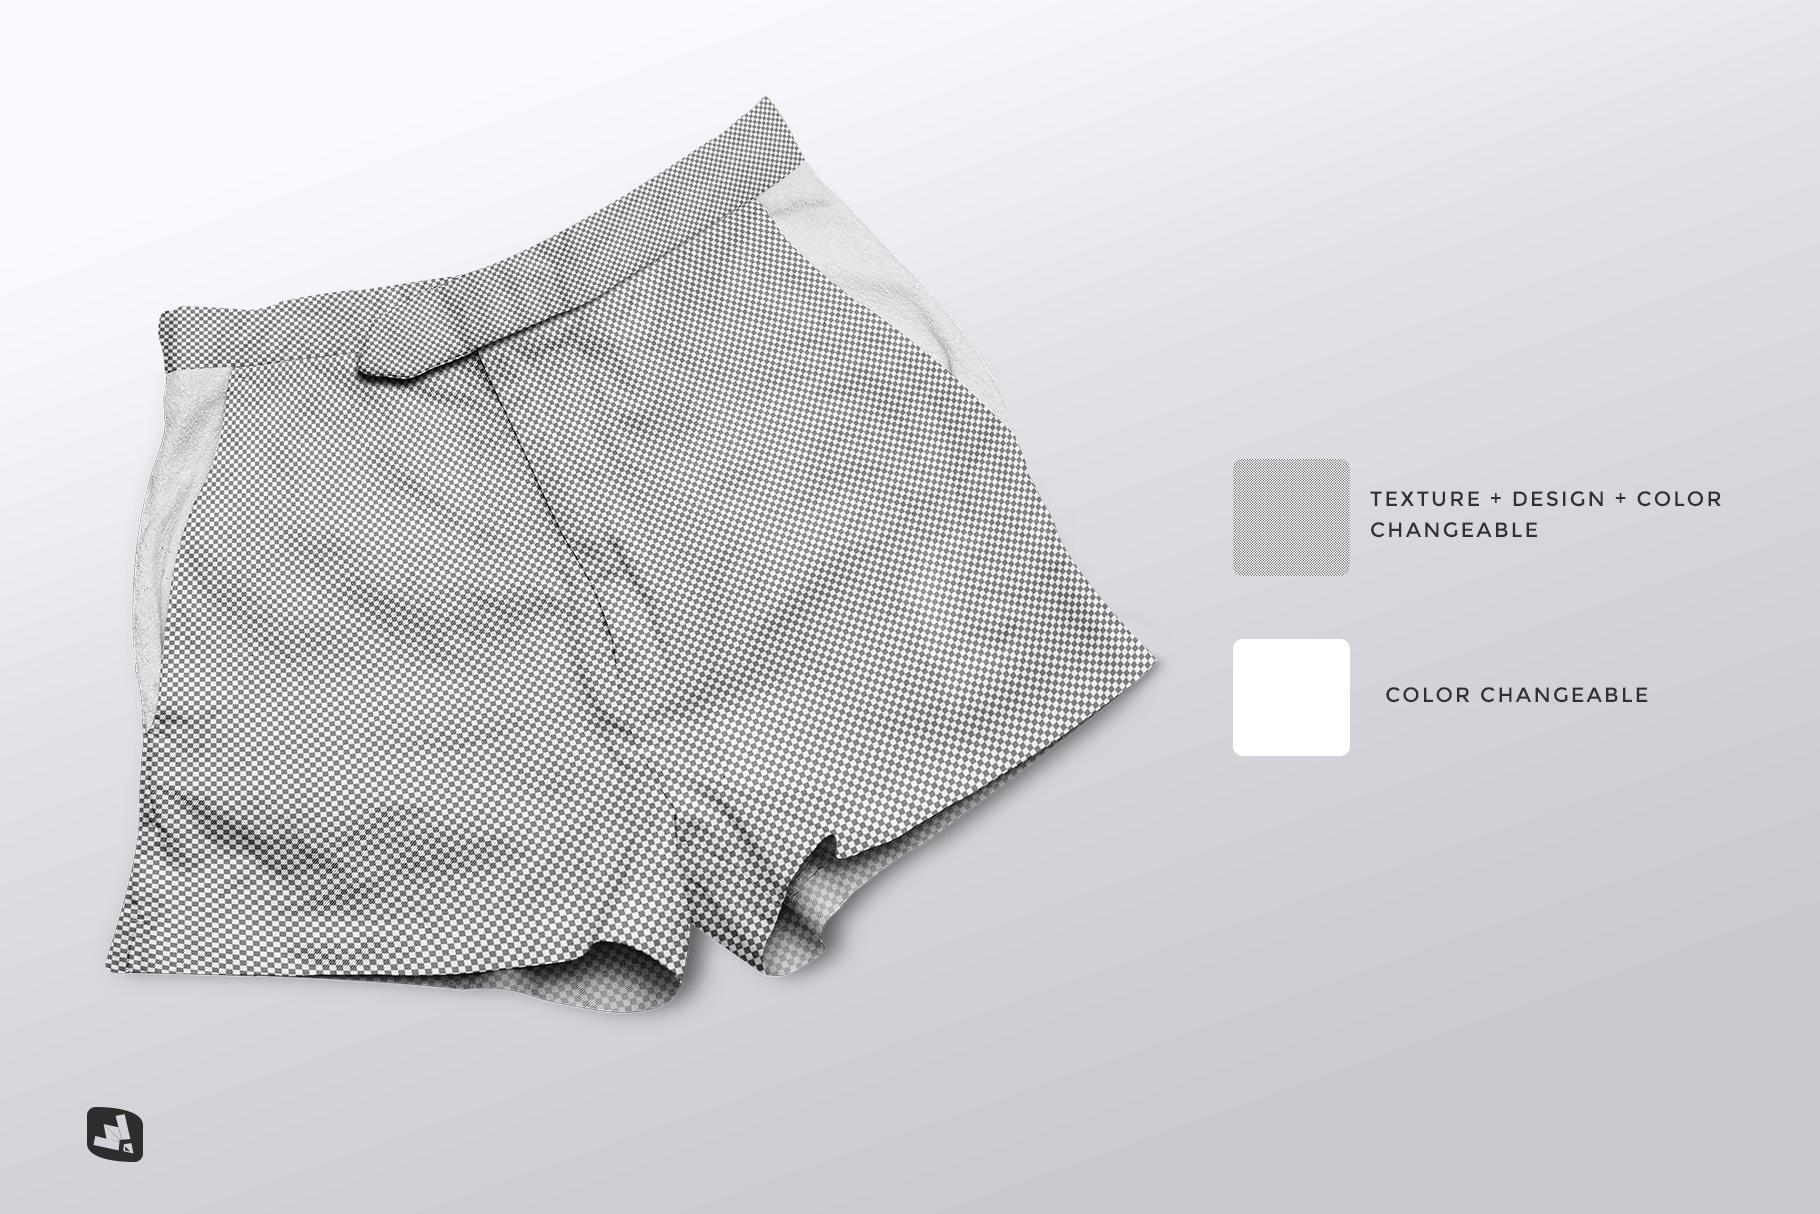 editability of the female cotton hot pants mockup